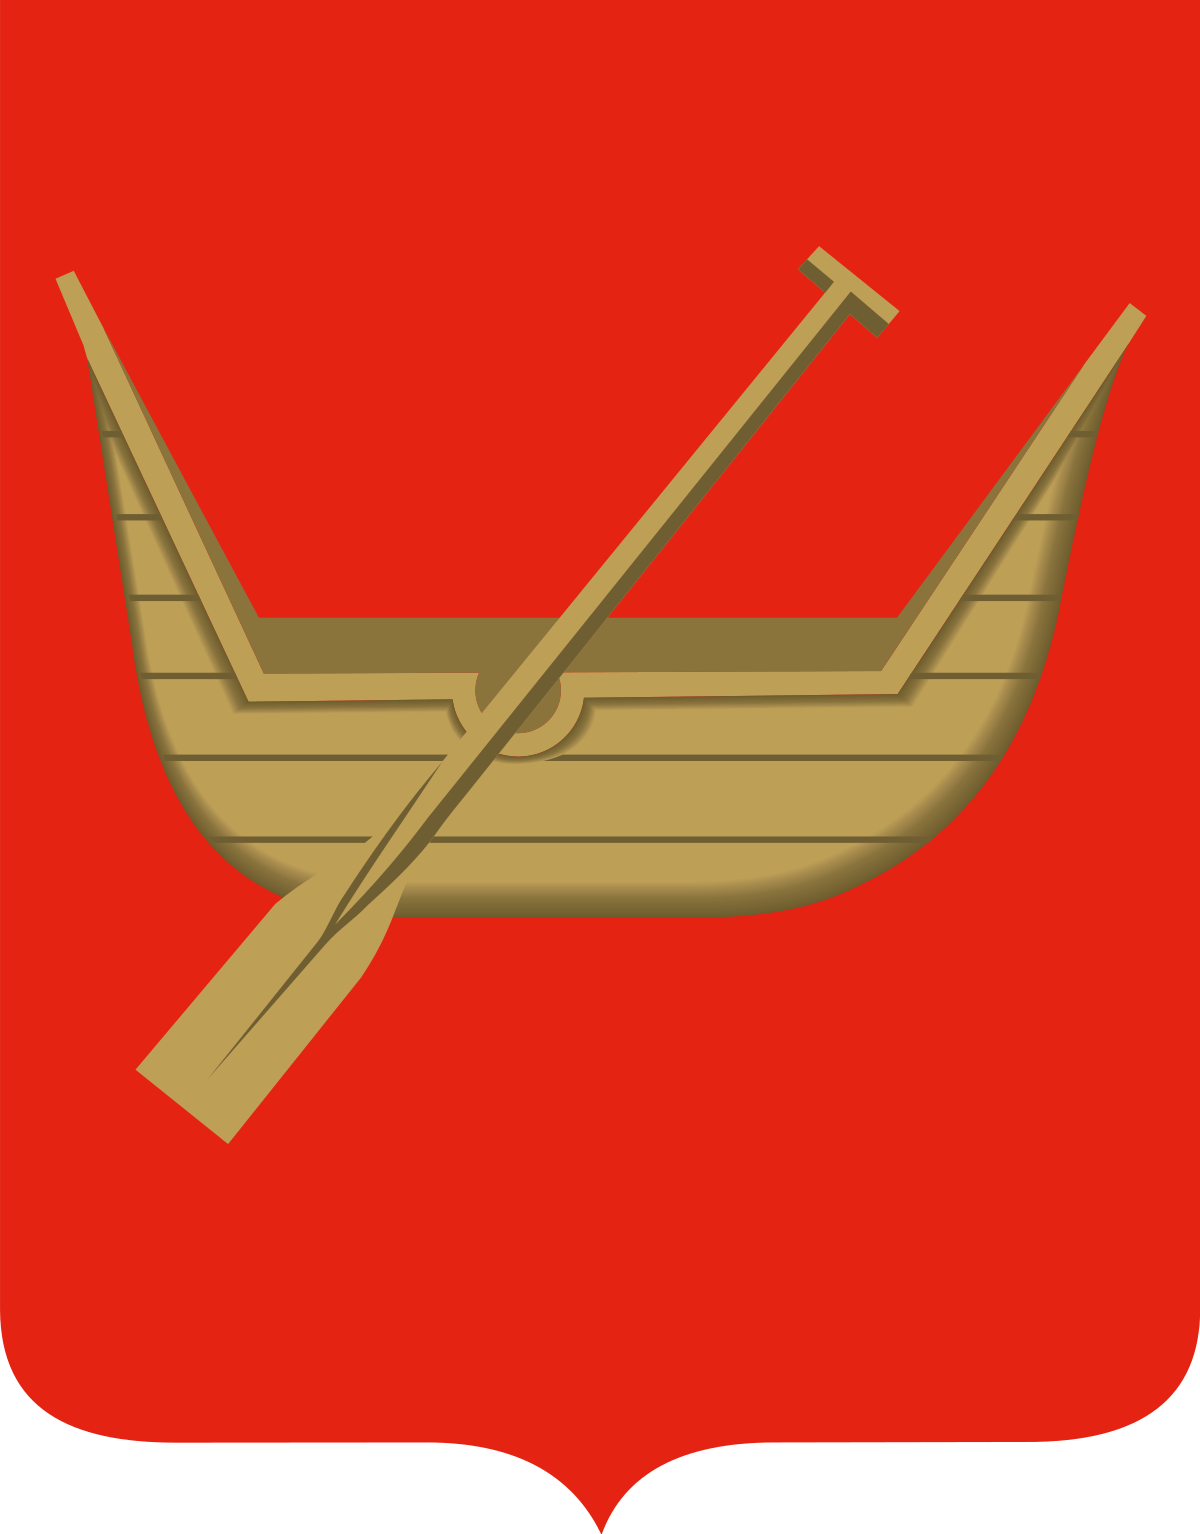 Herb miasta Łódź